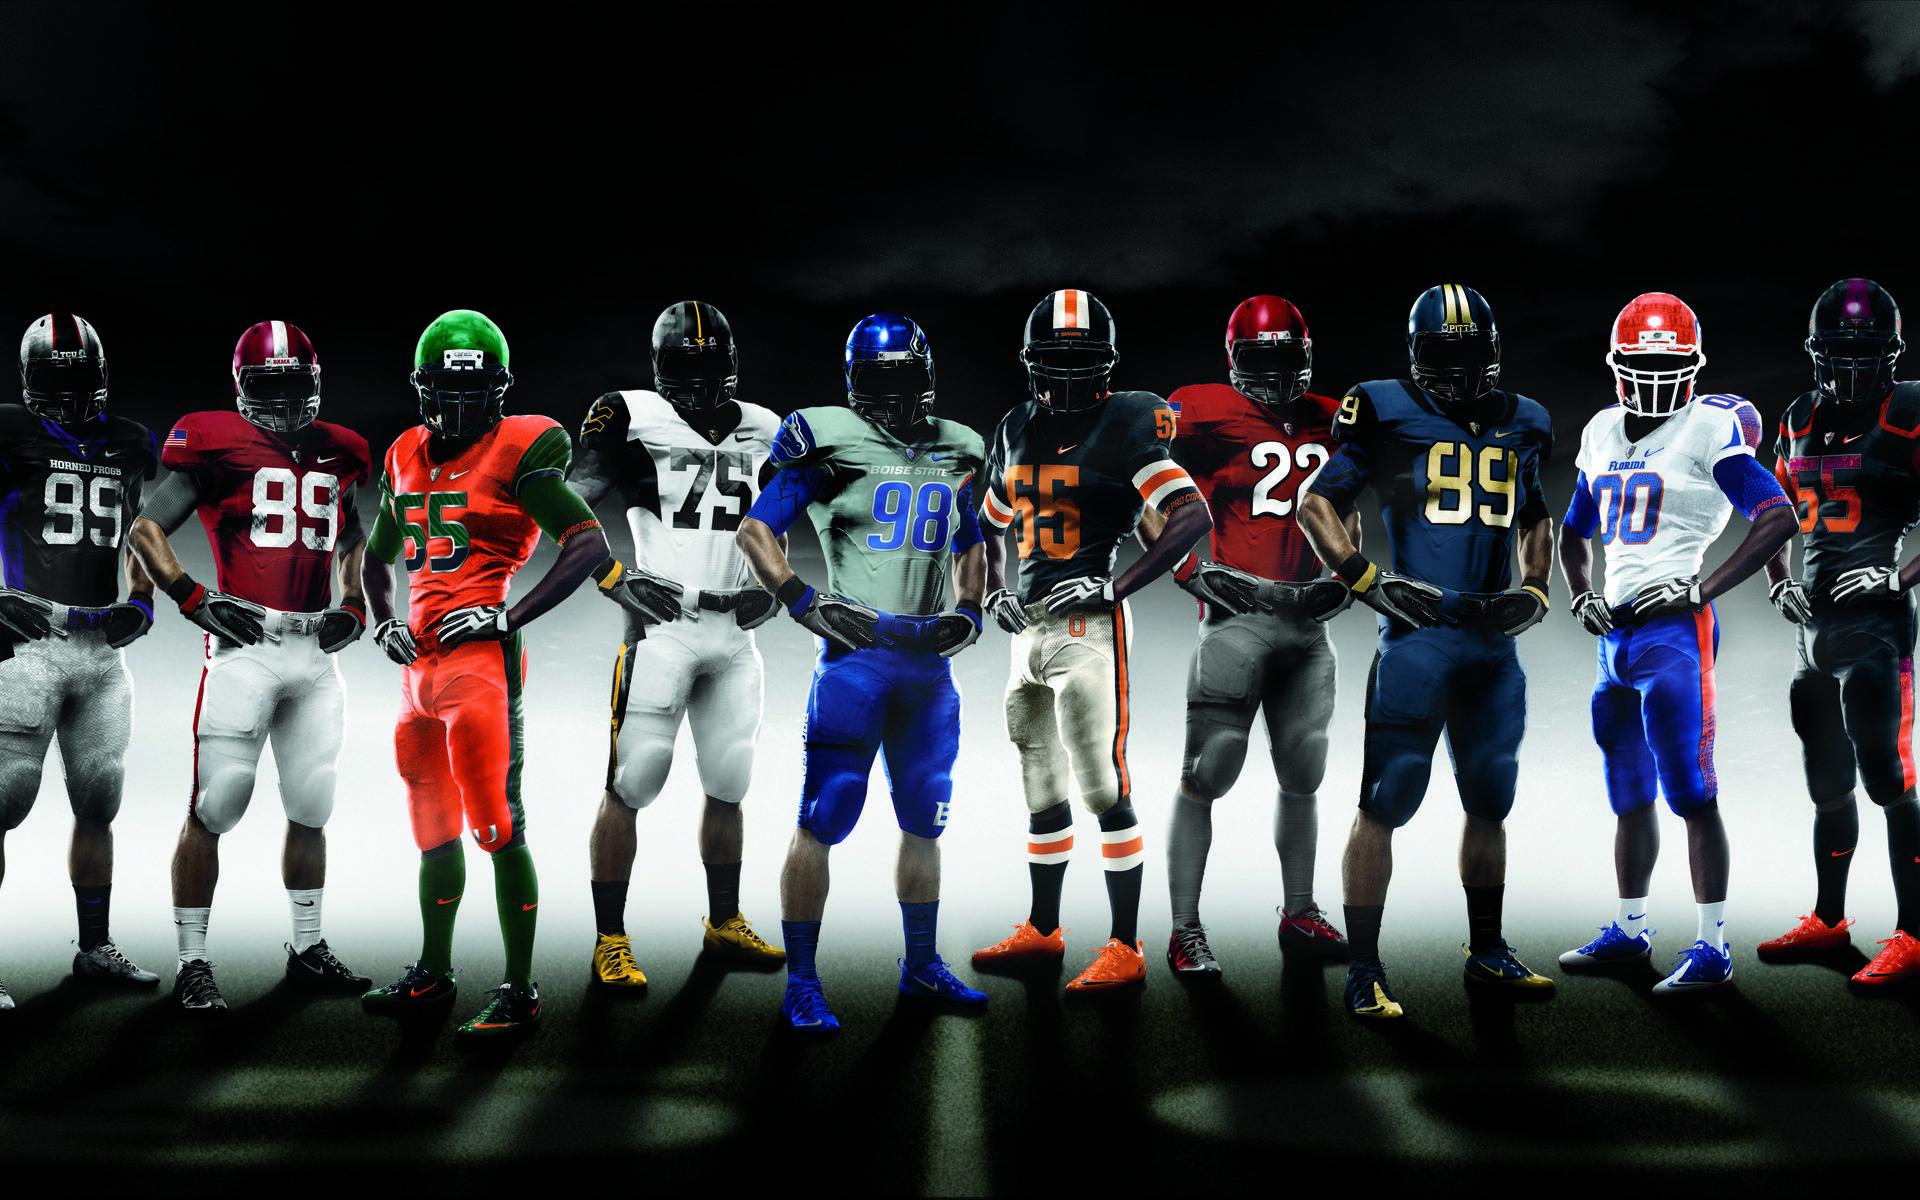 NFL Wallpaper Background